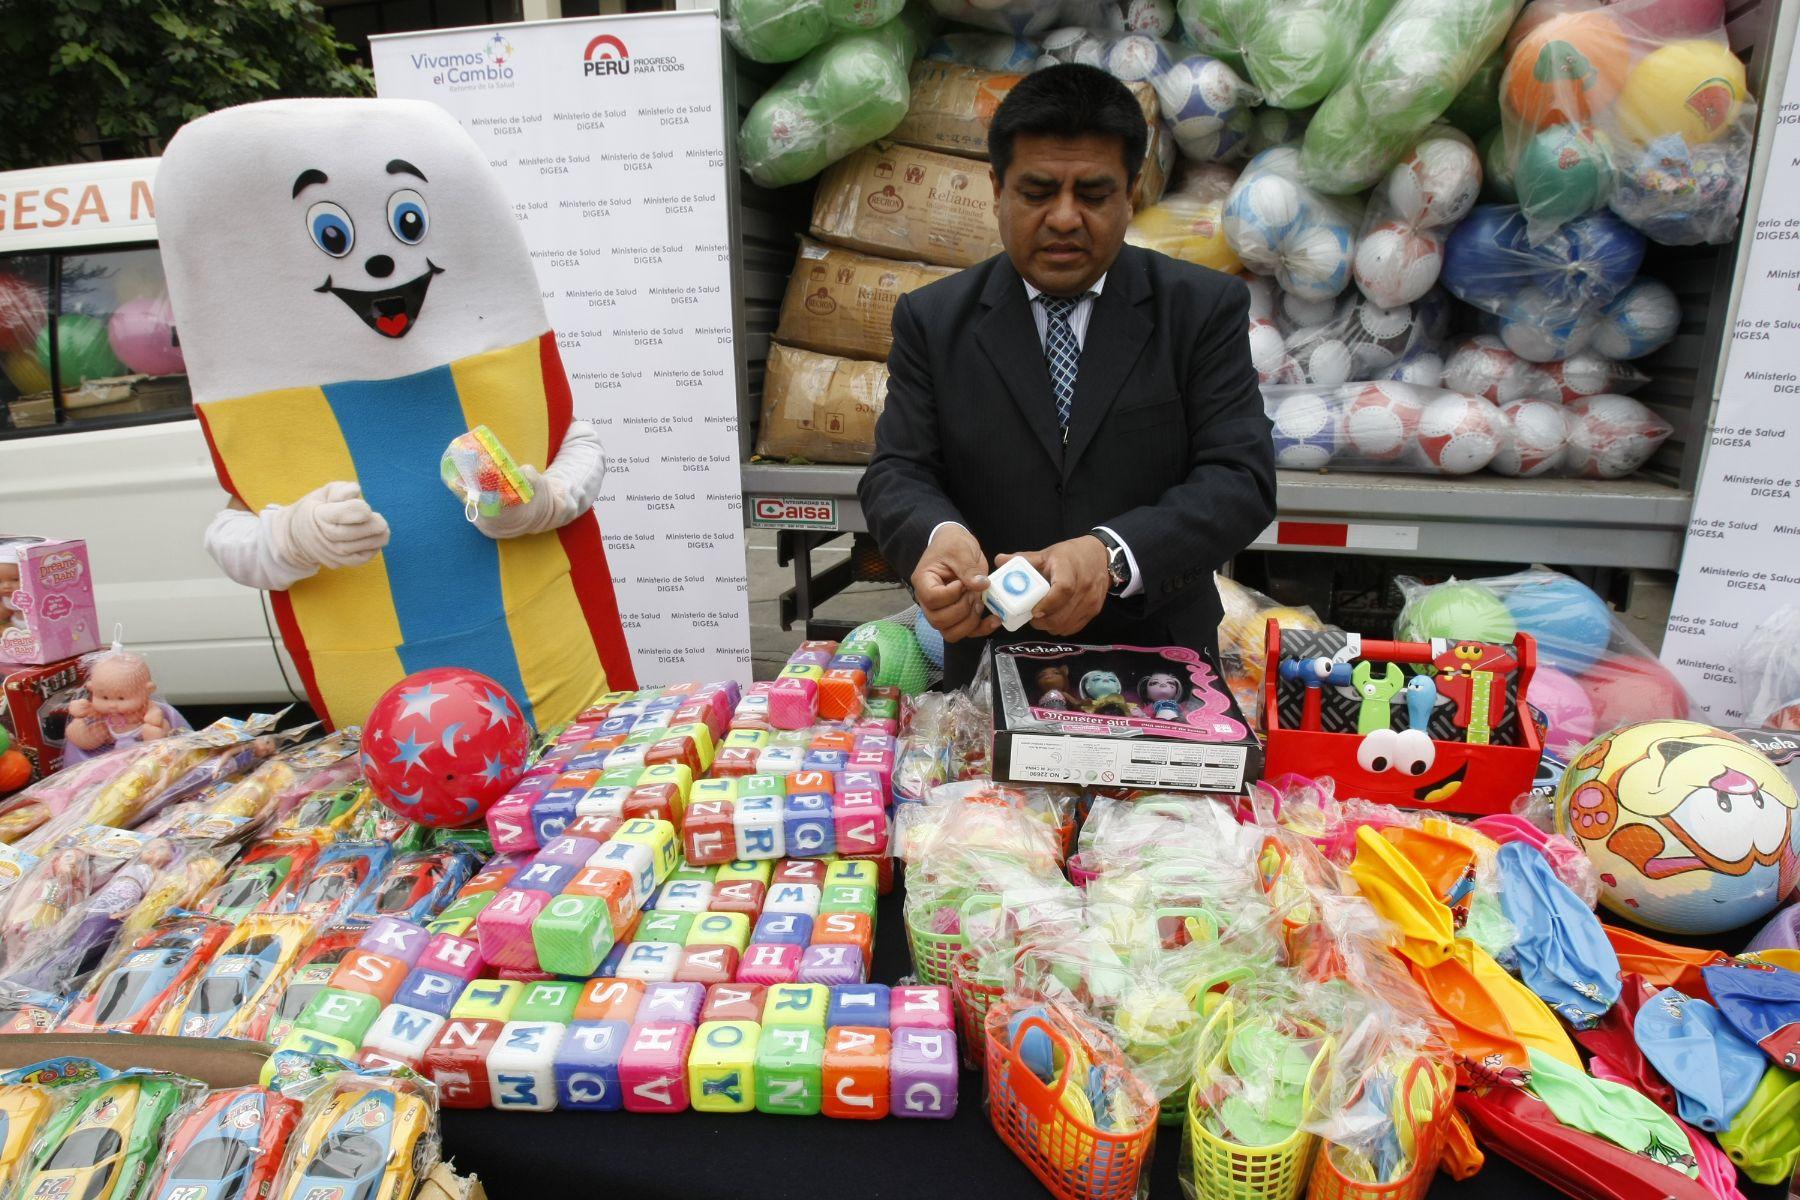 Director de Ecología de Digesa, Elmer Quichiz, lideró operativos de fiscalización de juguetes en Lima. Foto: ANDINA/Norman Córdova